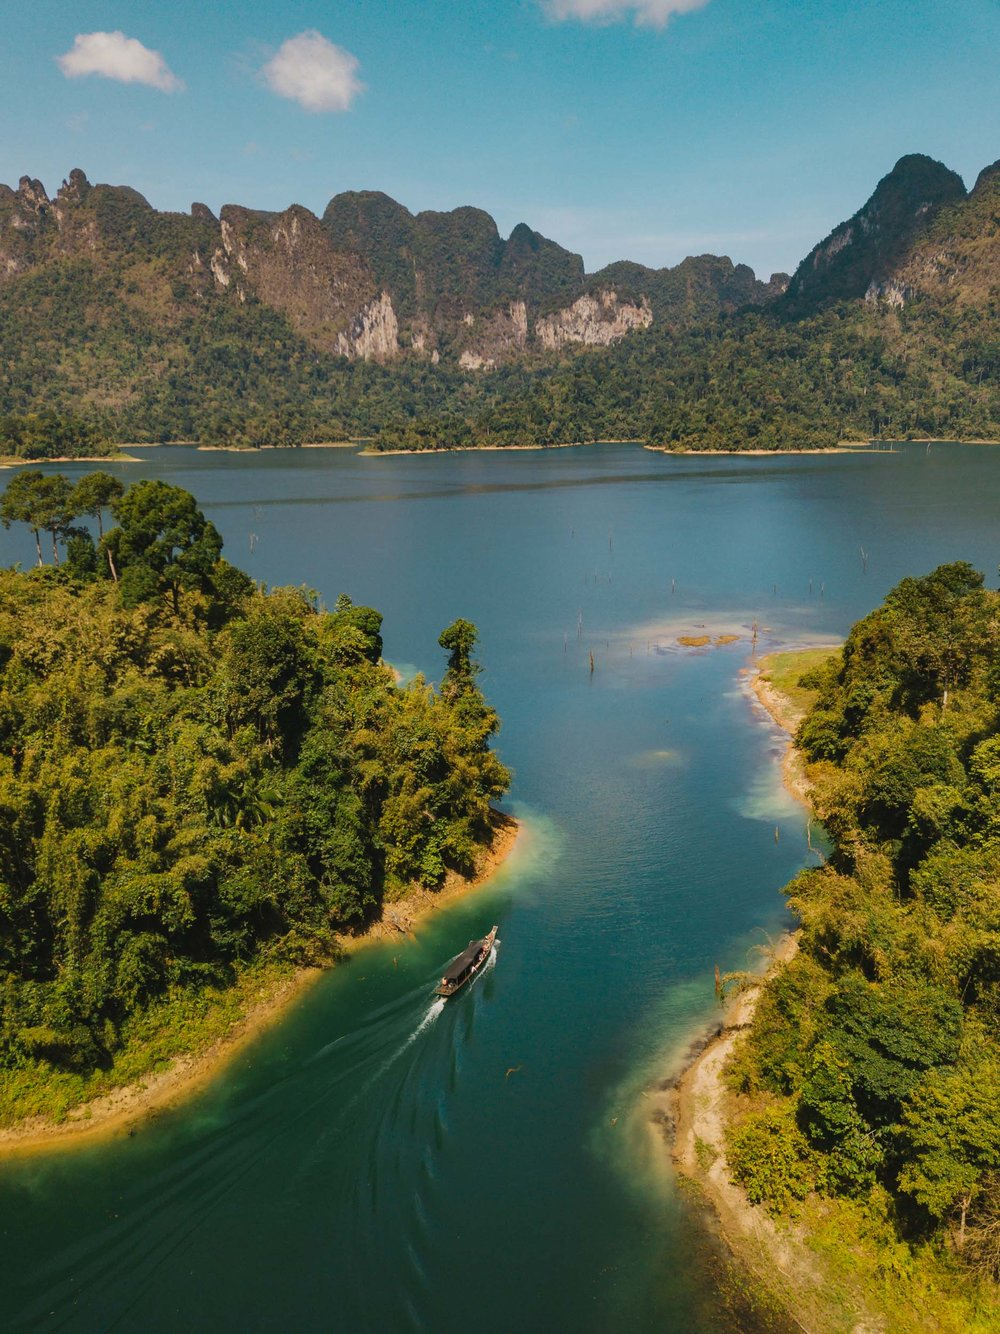 Thailand-20180306-000791.jpg